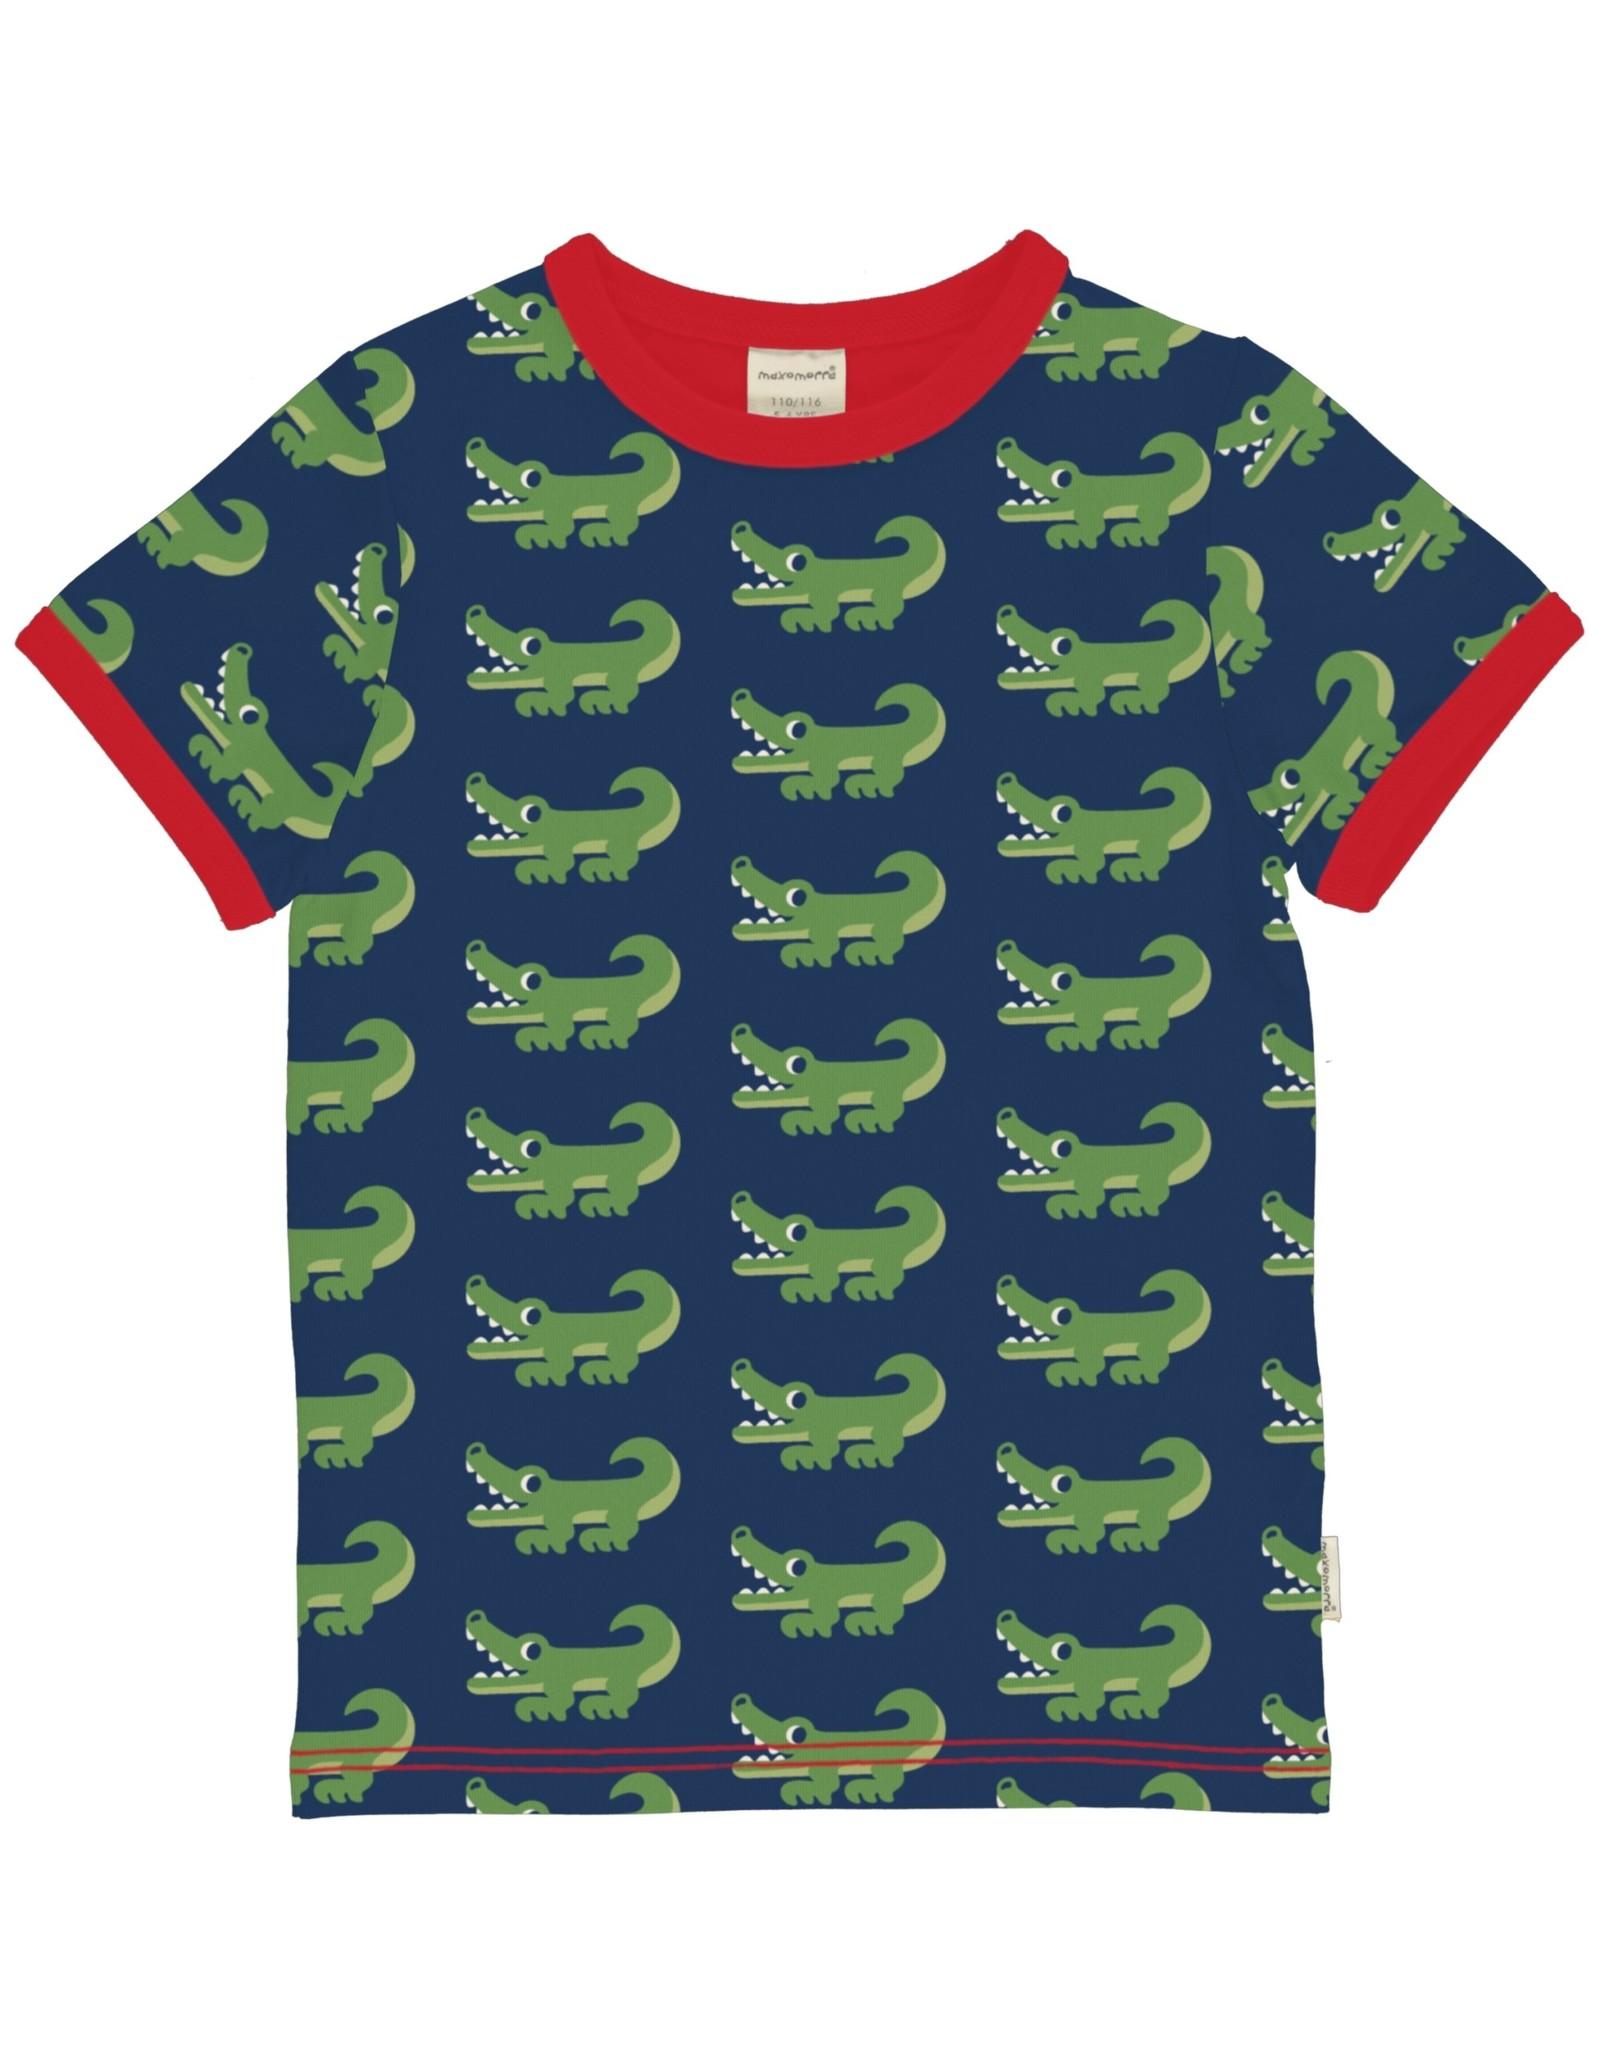 Maxomorra Krokodillen t-shirt